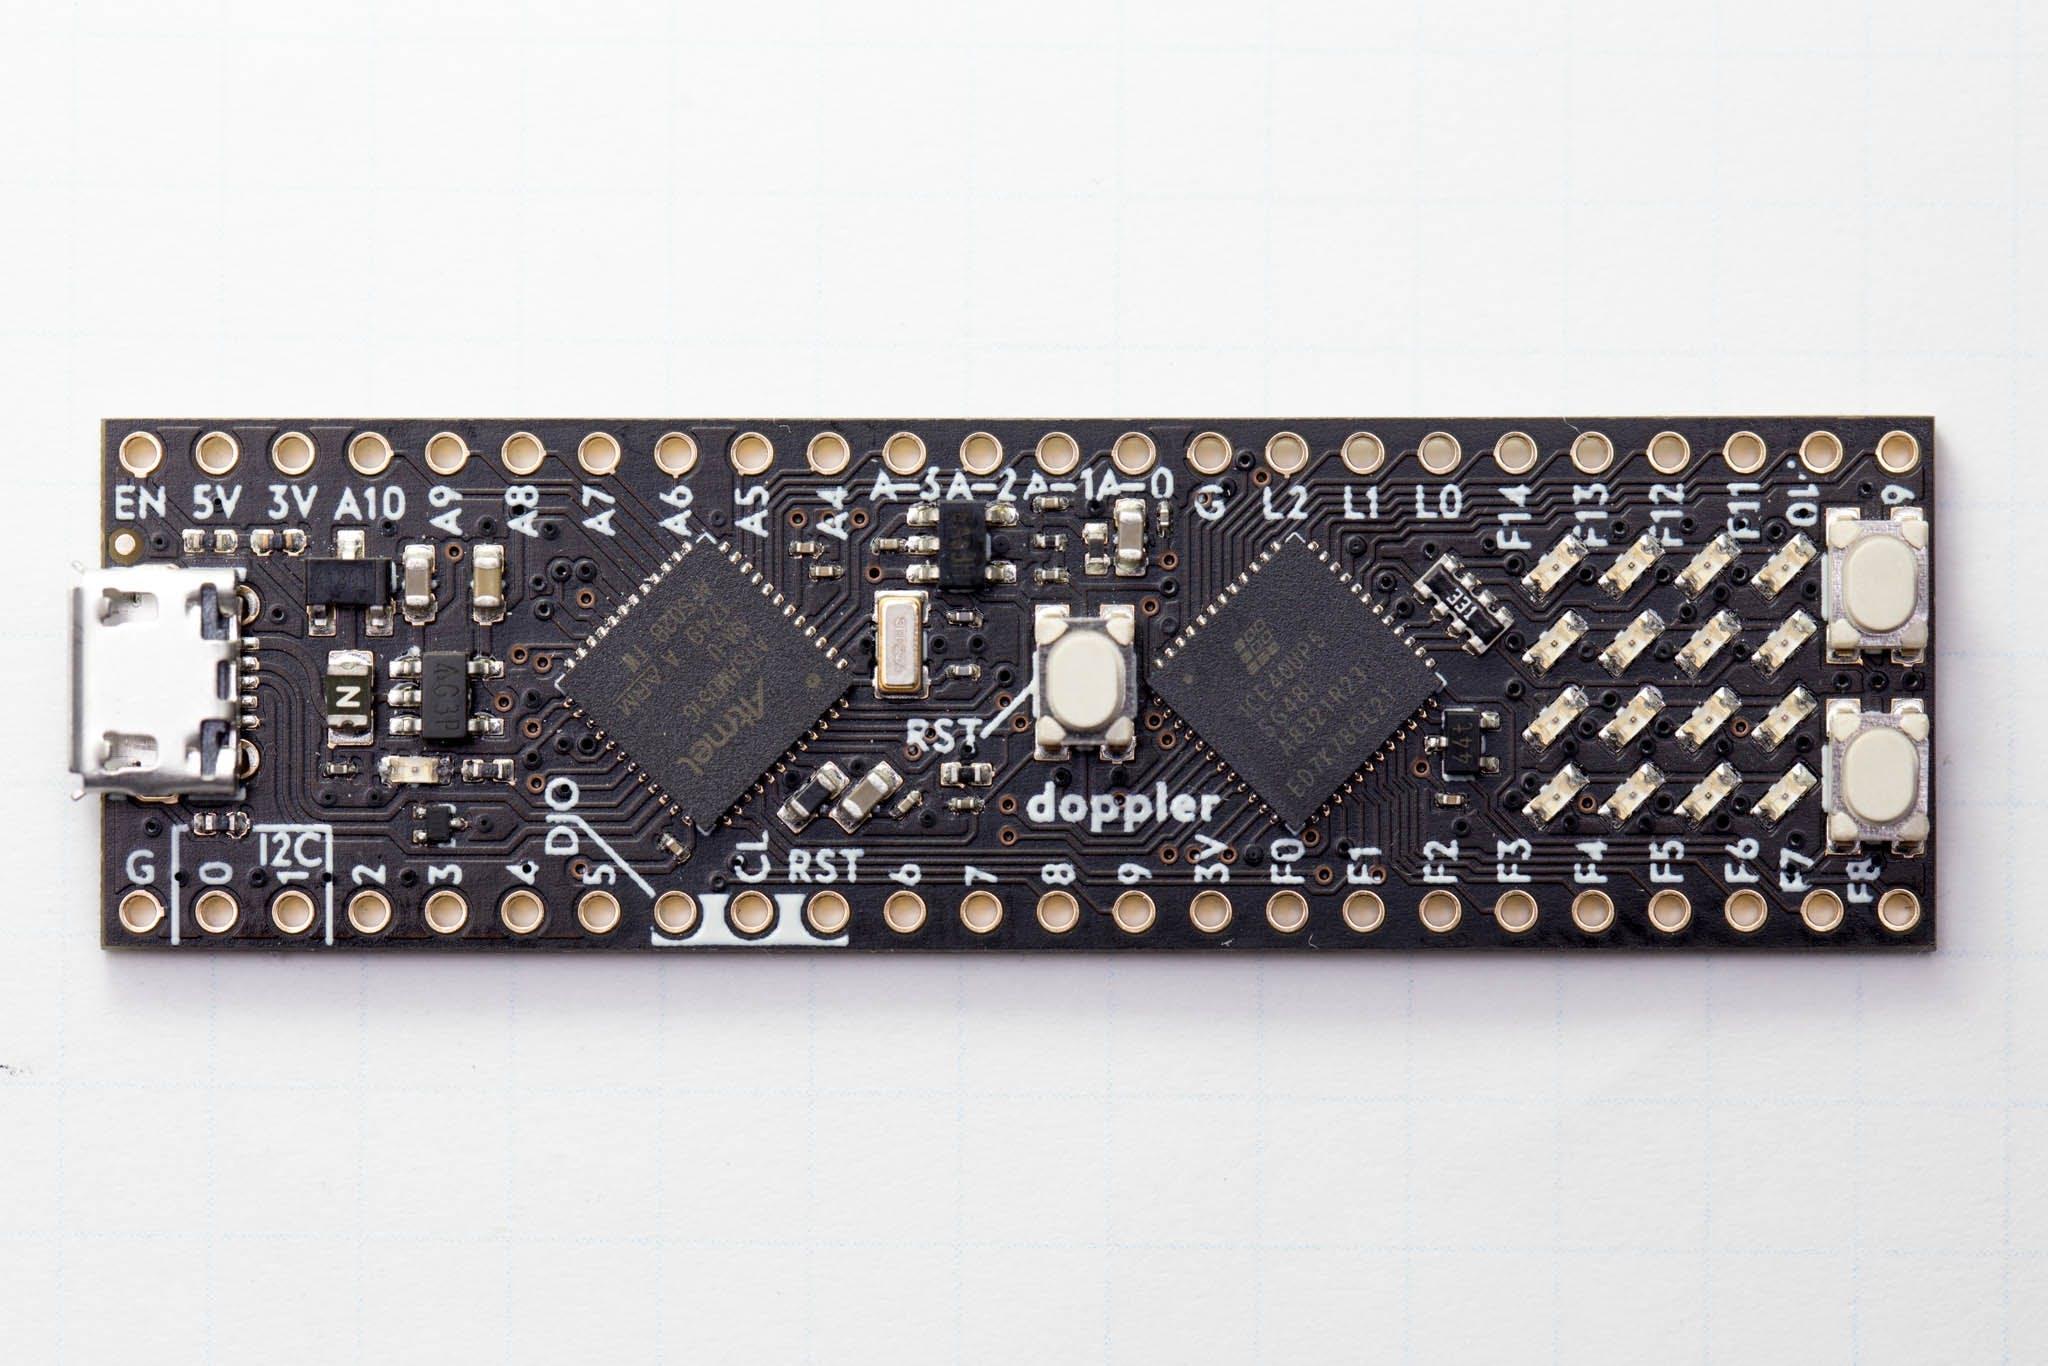 Dadamachines' Doppler Development Board Packs Both a SAM D51